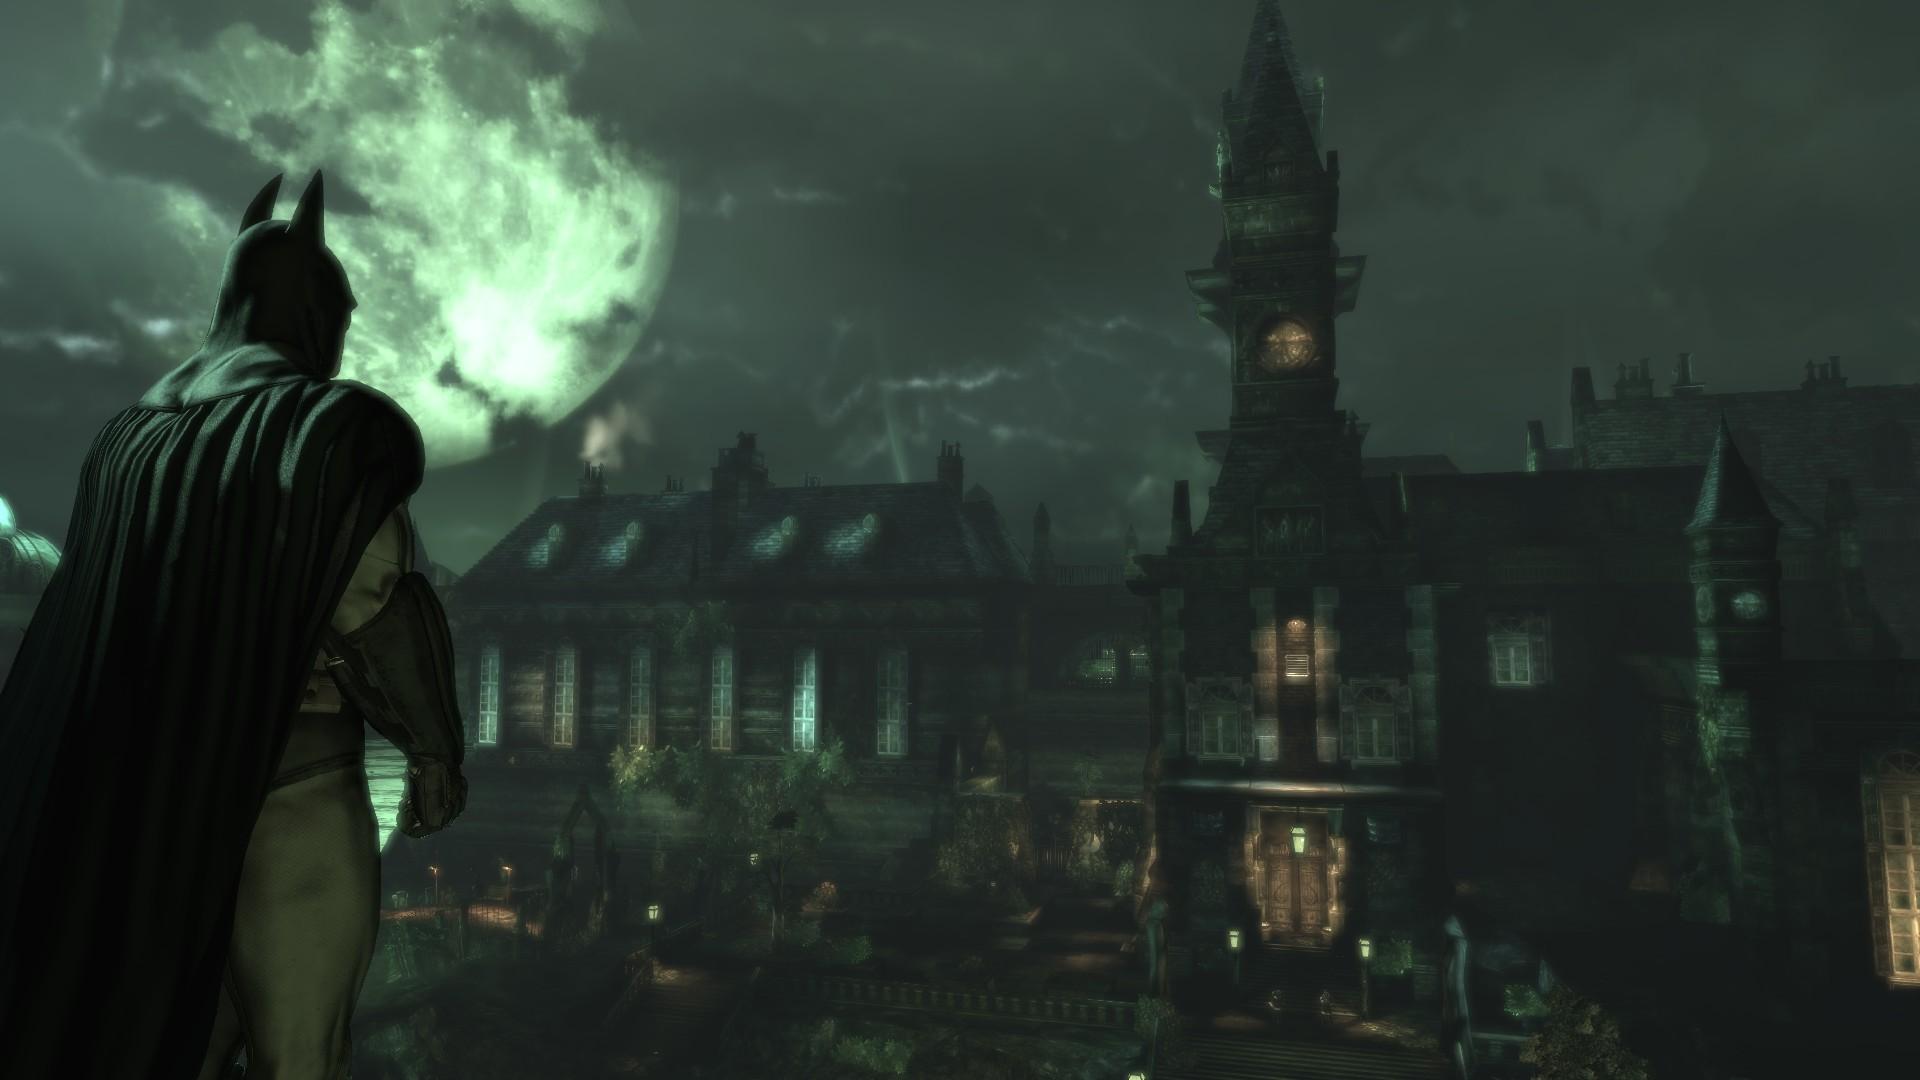 Batman Arkham Asylum Fondo De Pantalla Hd Fondo De